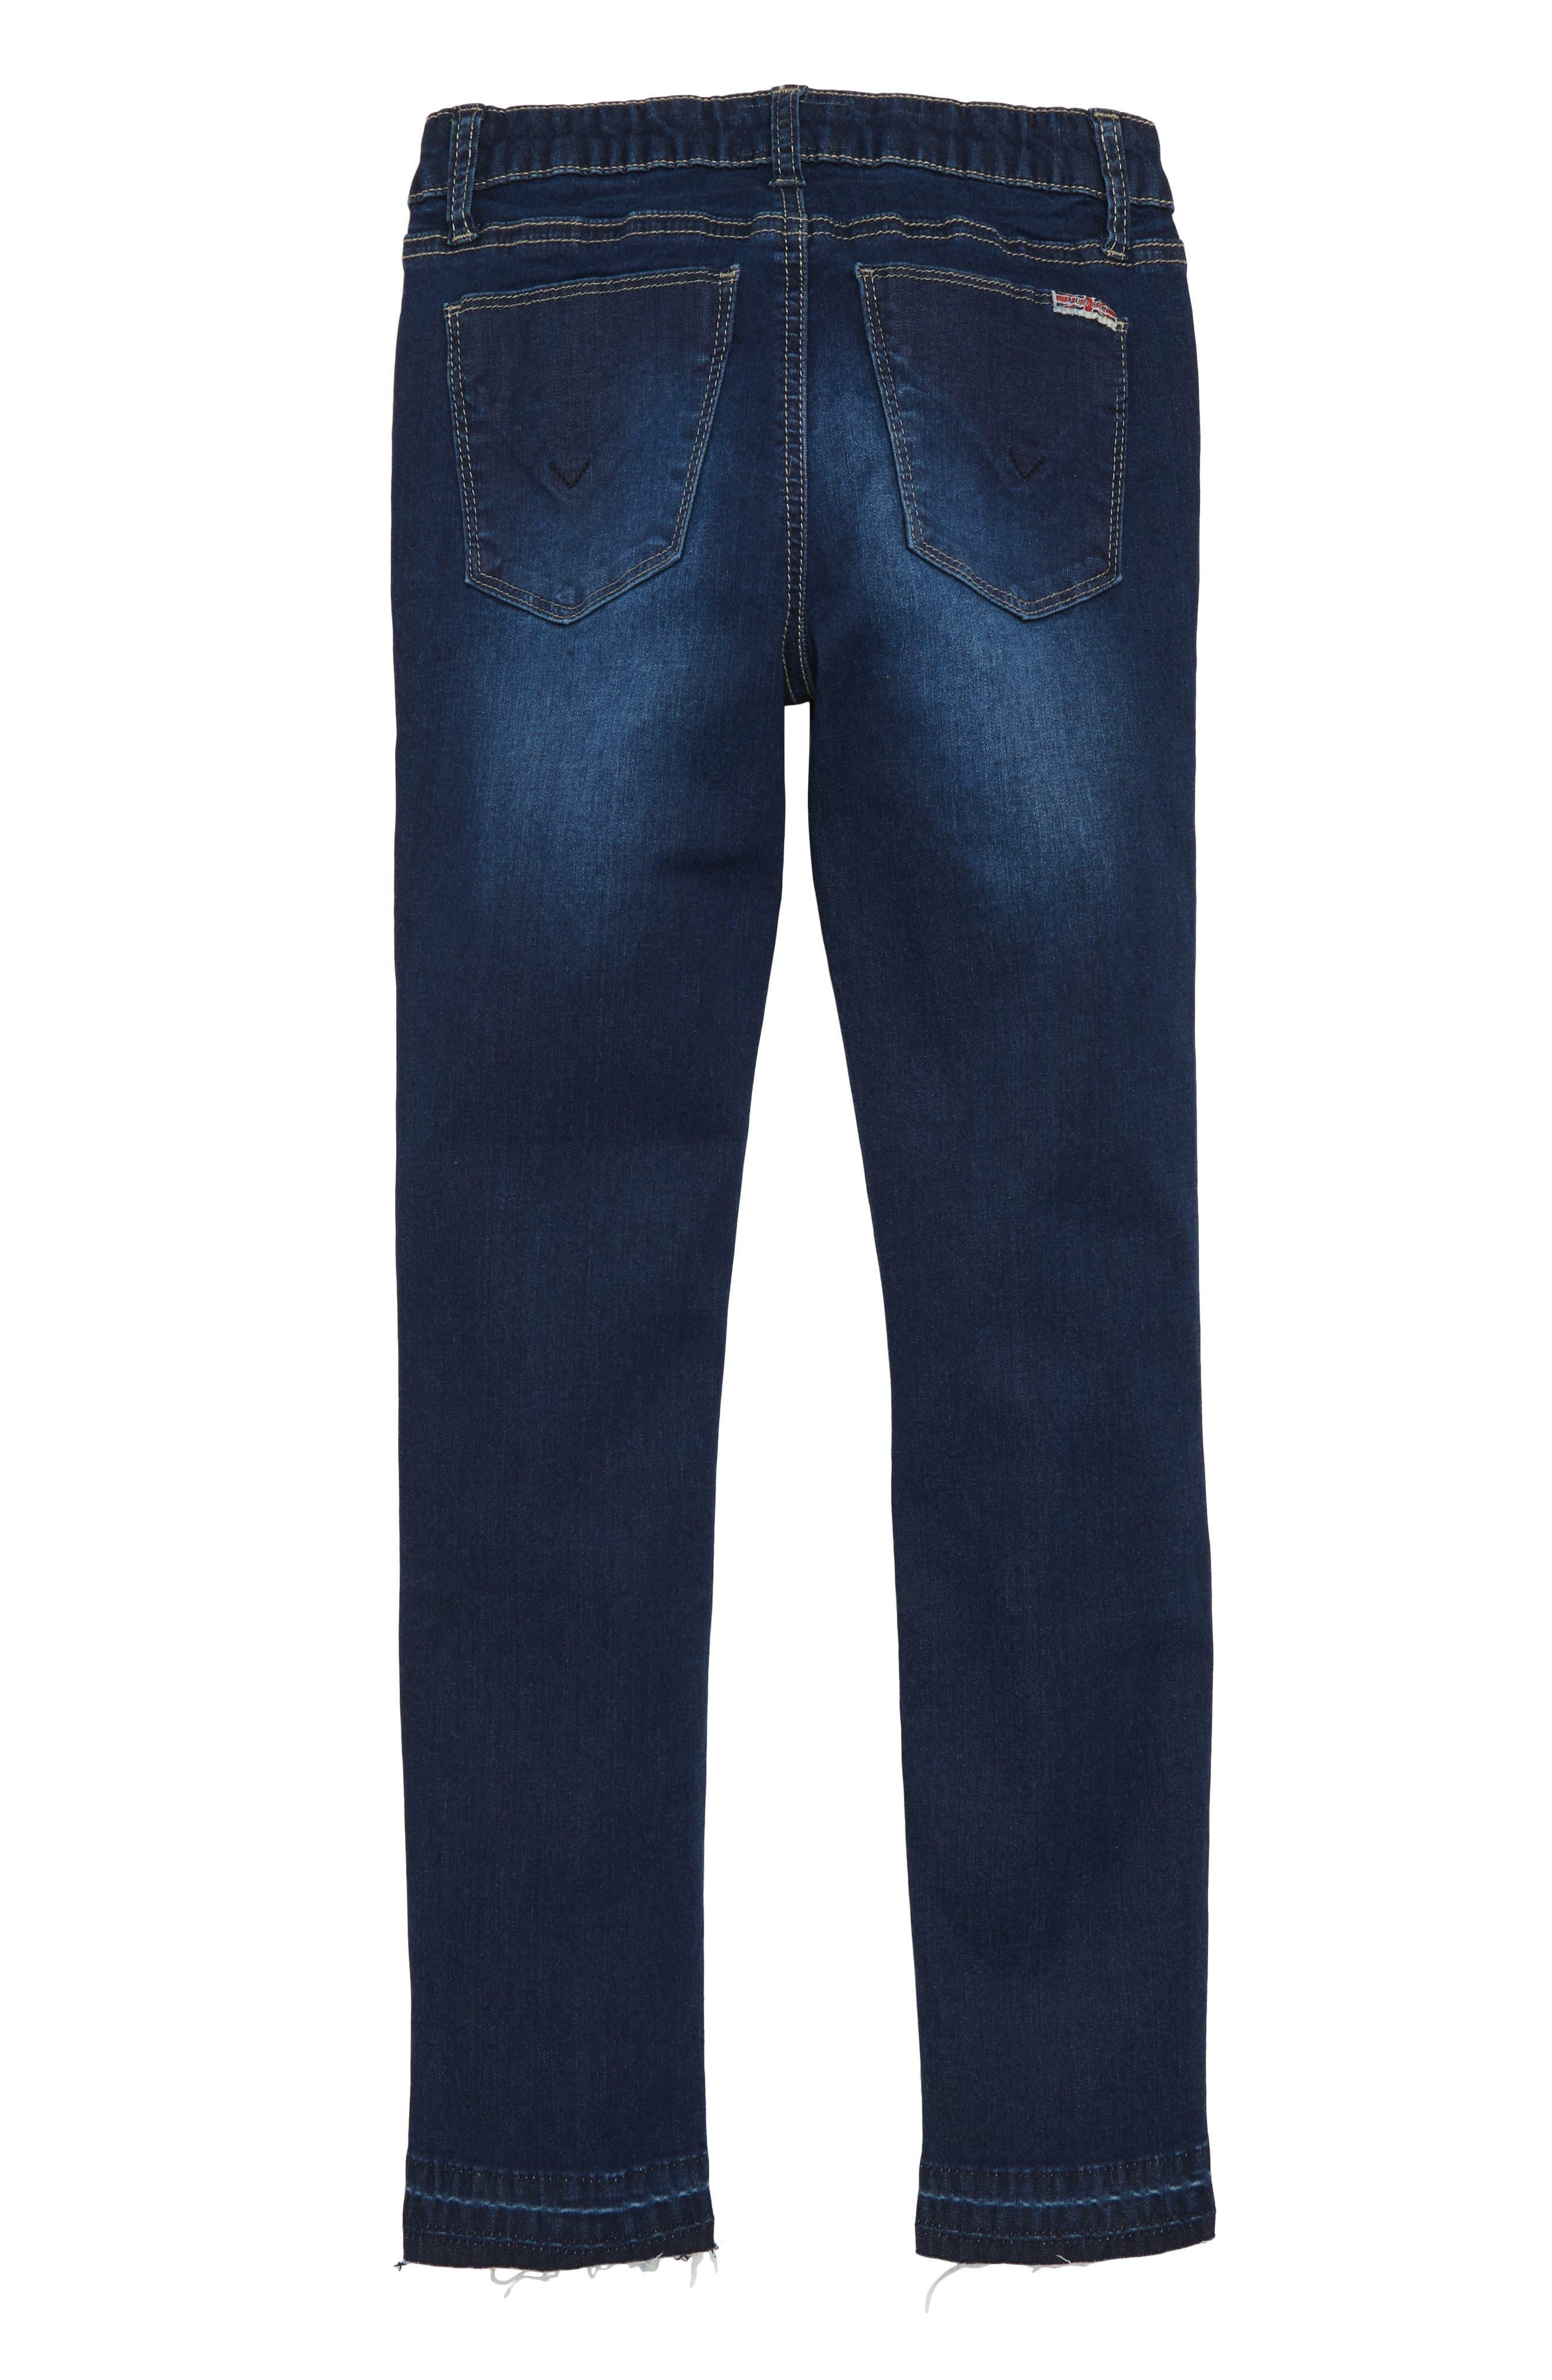 Christa Release Hem Skinny Jeans,                             Alternate thumbnail 2, color,                             GLEAM WASH